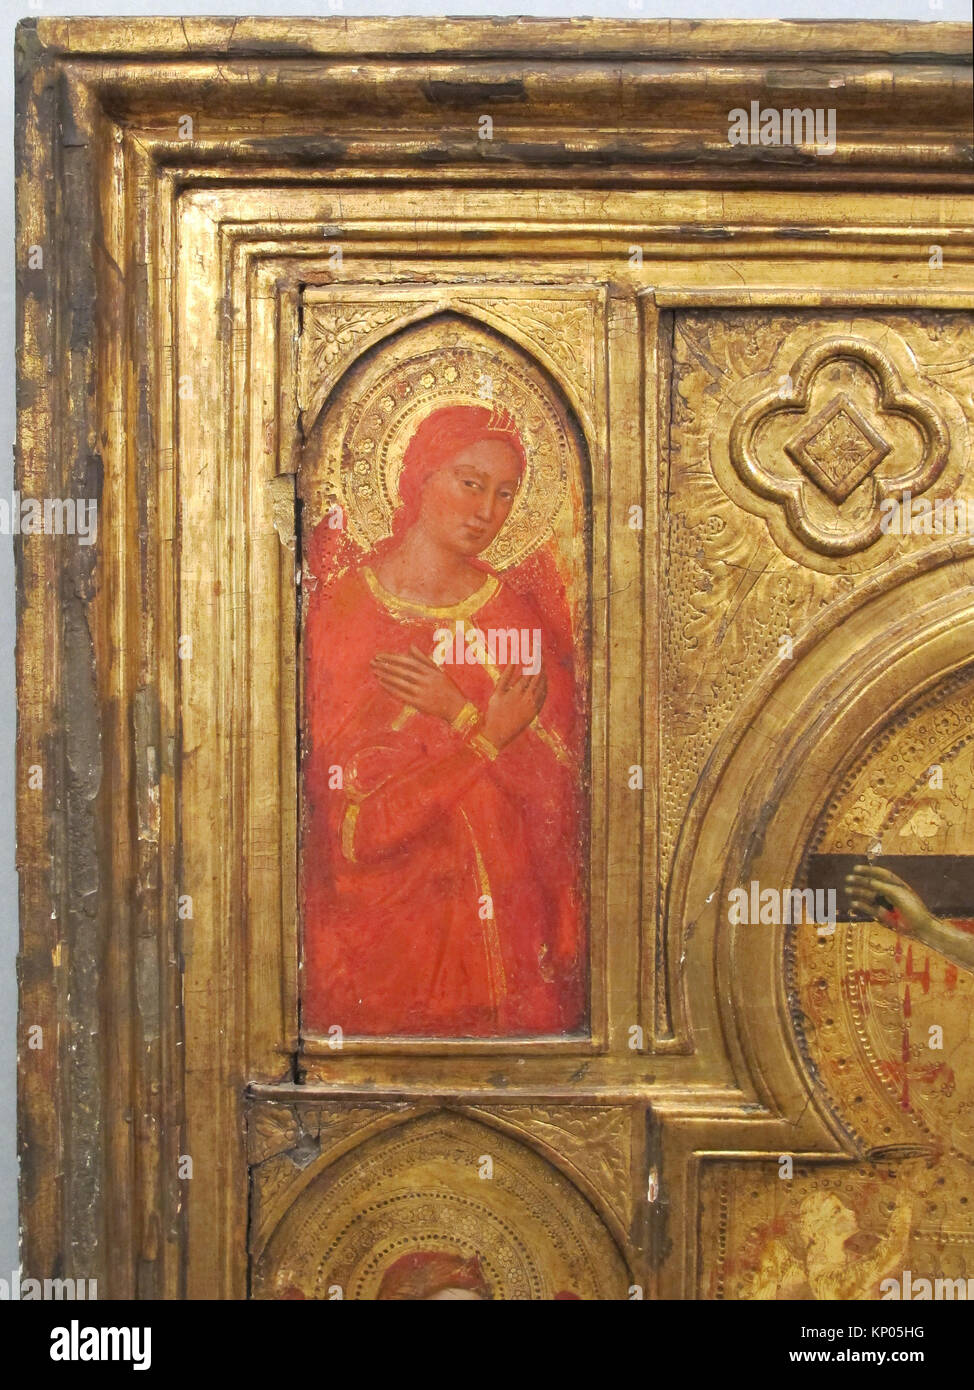 Six Angels. Artist: Jacopo di Cione (Italian, Florence, active ca. 1360-1400); Date: ca. 1365; Medium: Tempera on - Stock Image